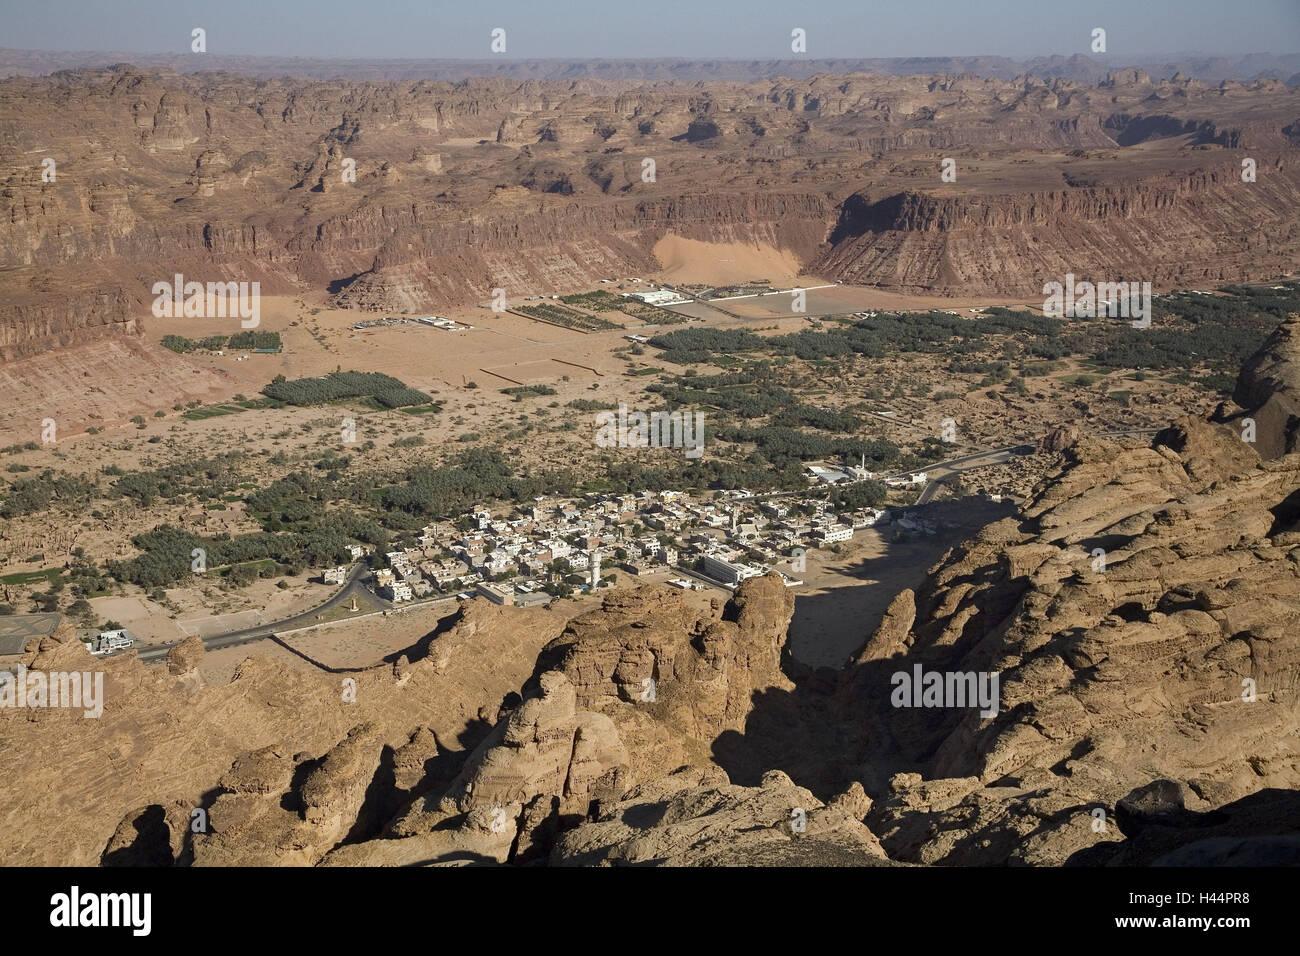 Saudi Arabia, province Tabuk, provincial town Al Ula, aerial shots, - Stock Image